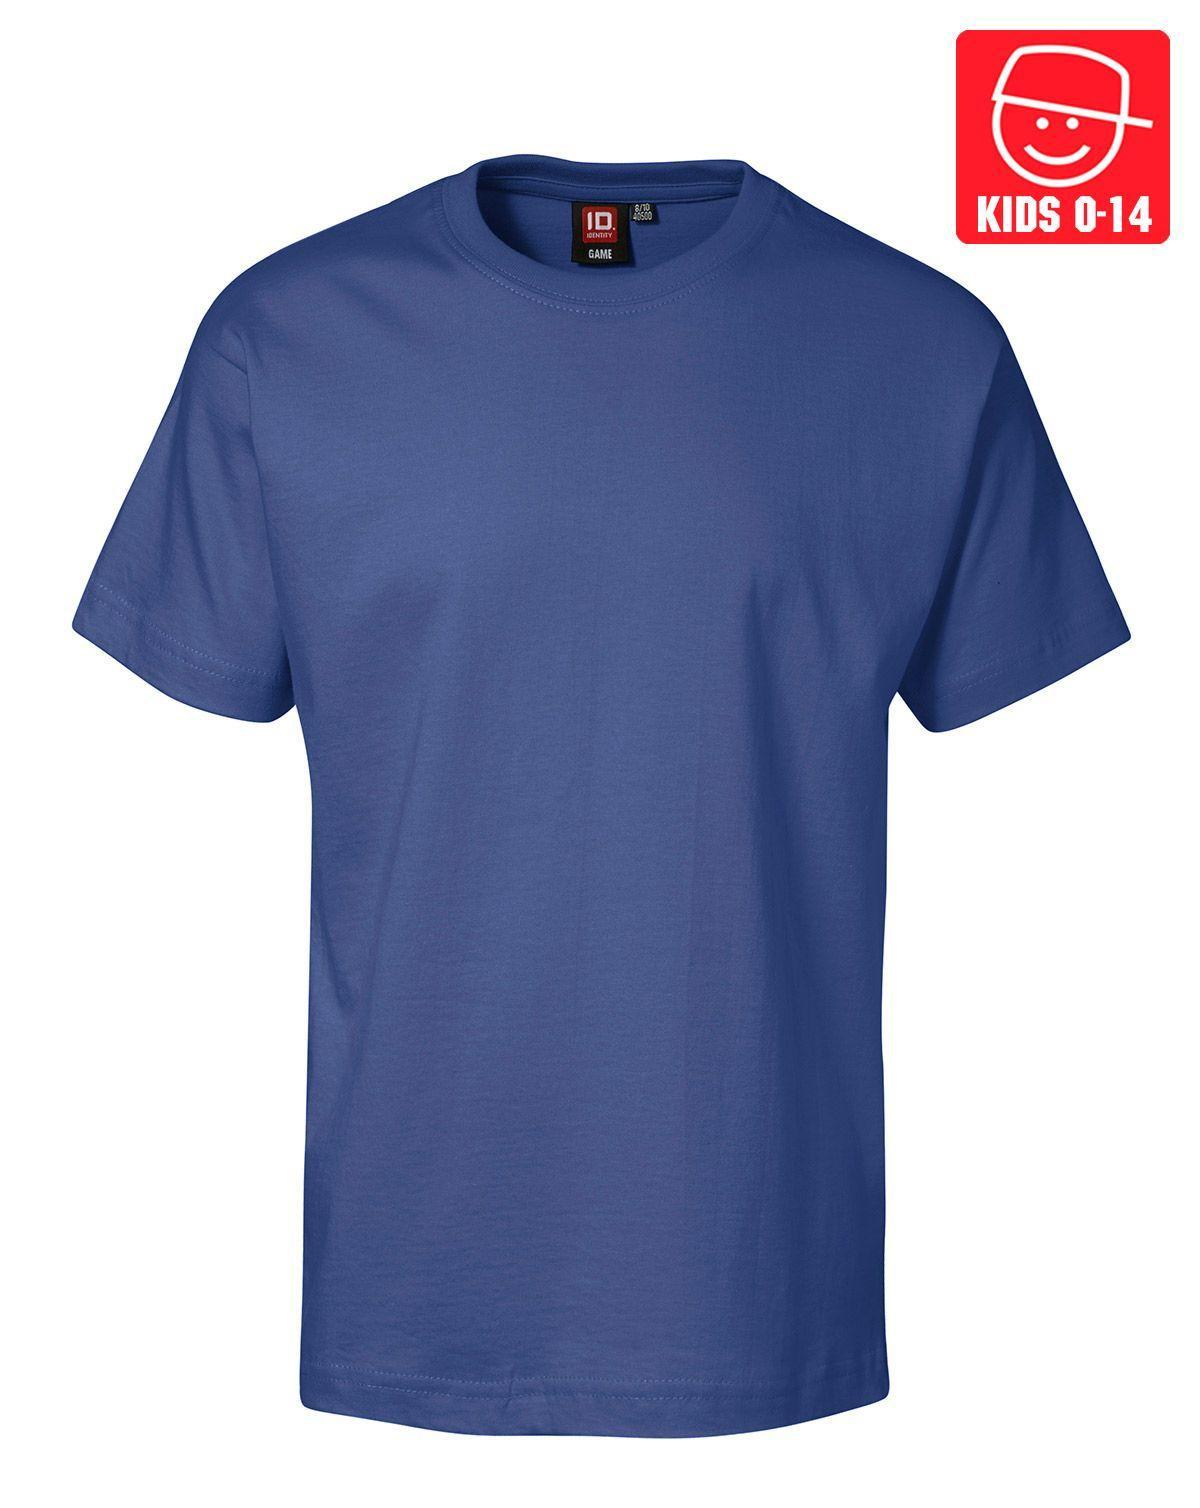 Image of   ID T-shirts (Kongeblå, 128)